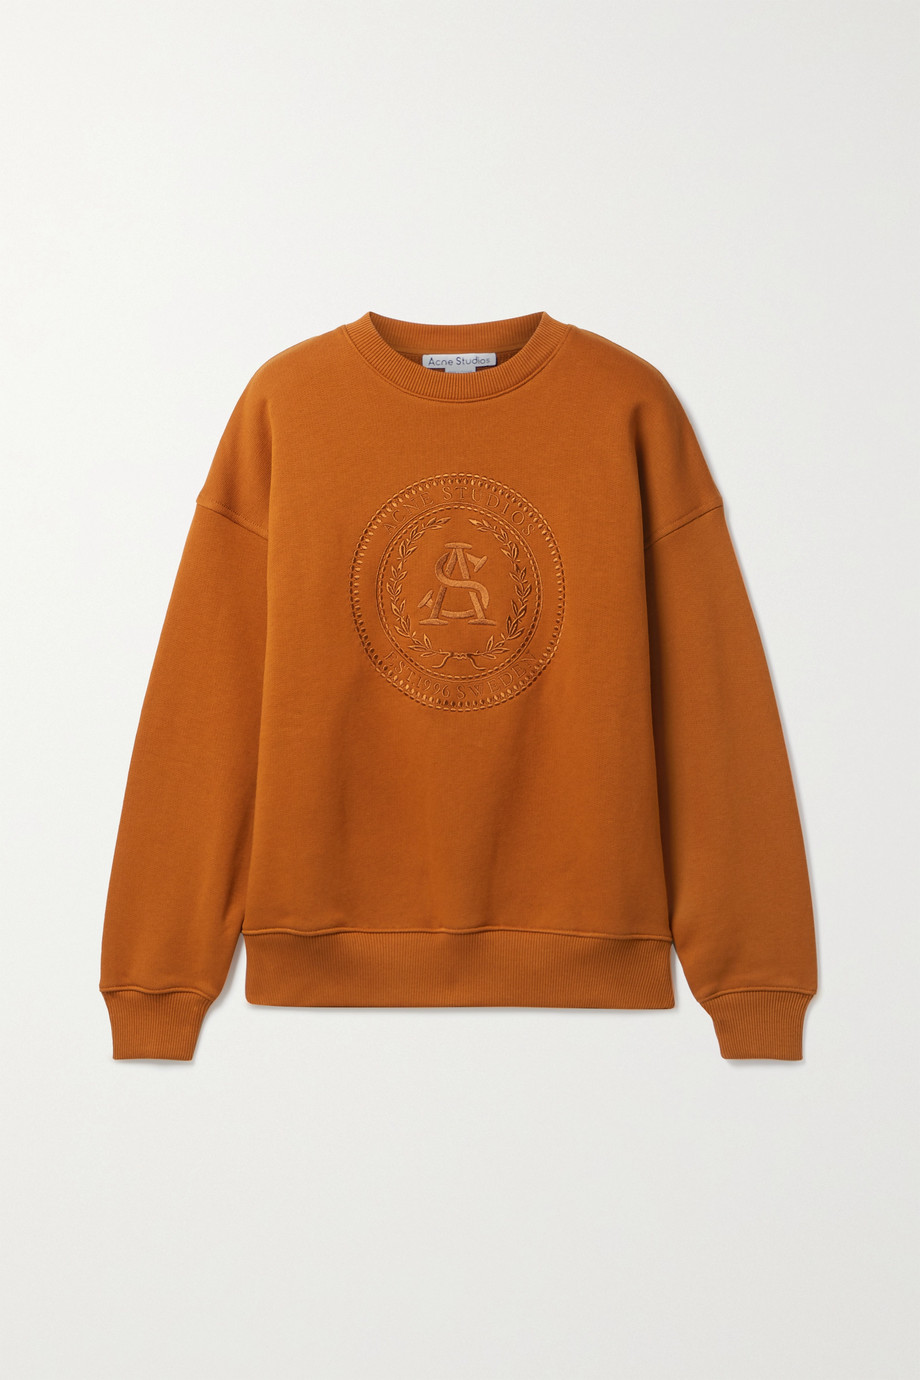 Acne Studios + NET SUSTAIN embroidered organic cotton-jersey sweatshirt